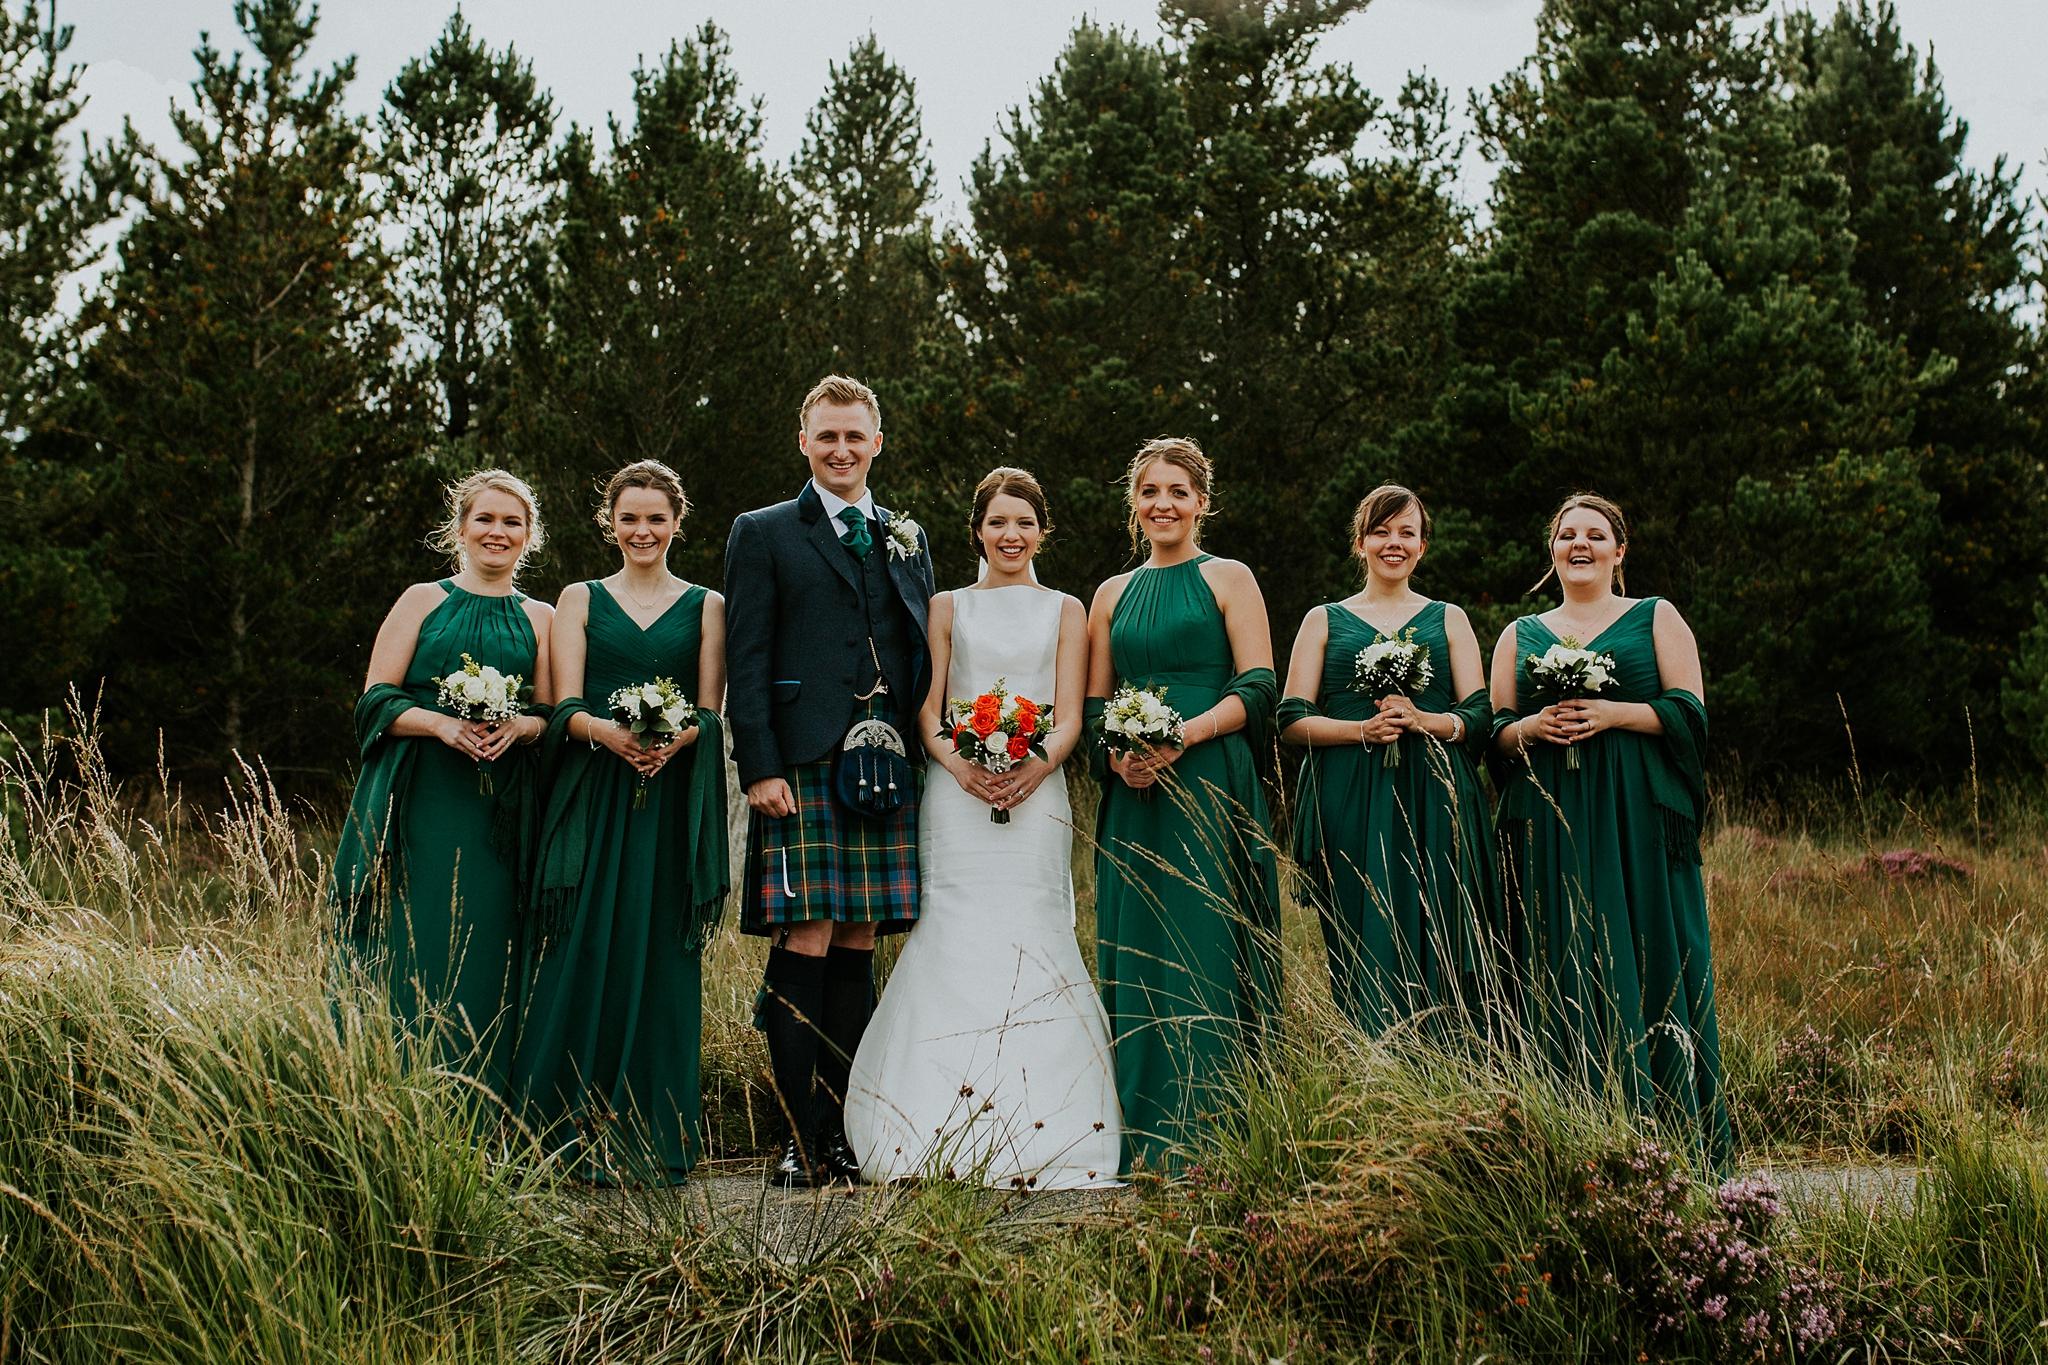 Linda&Shockie_northuist_wedding_photographer-36.JPG